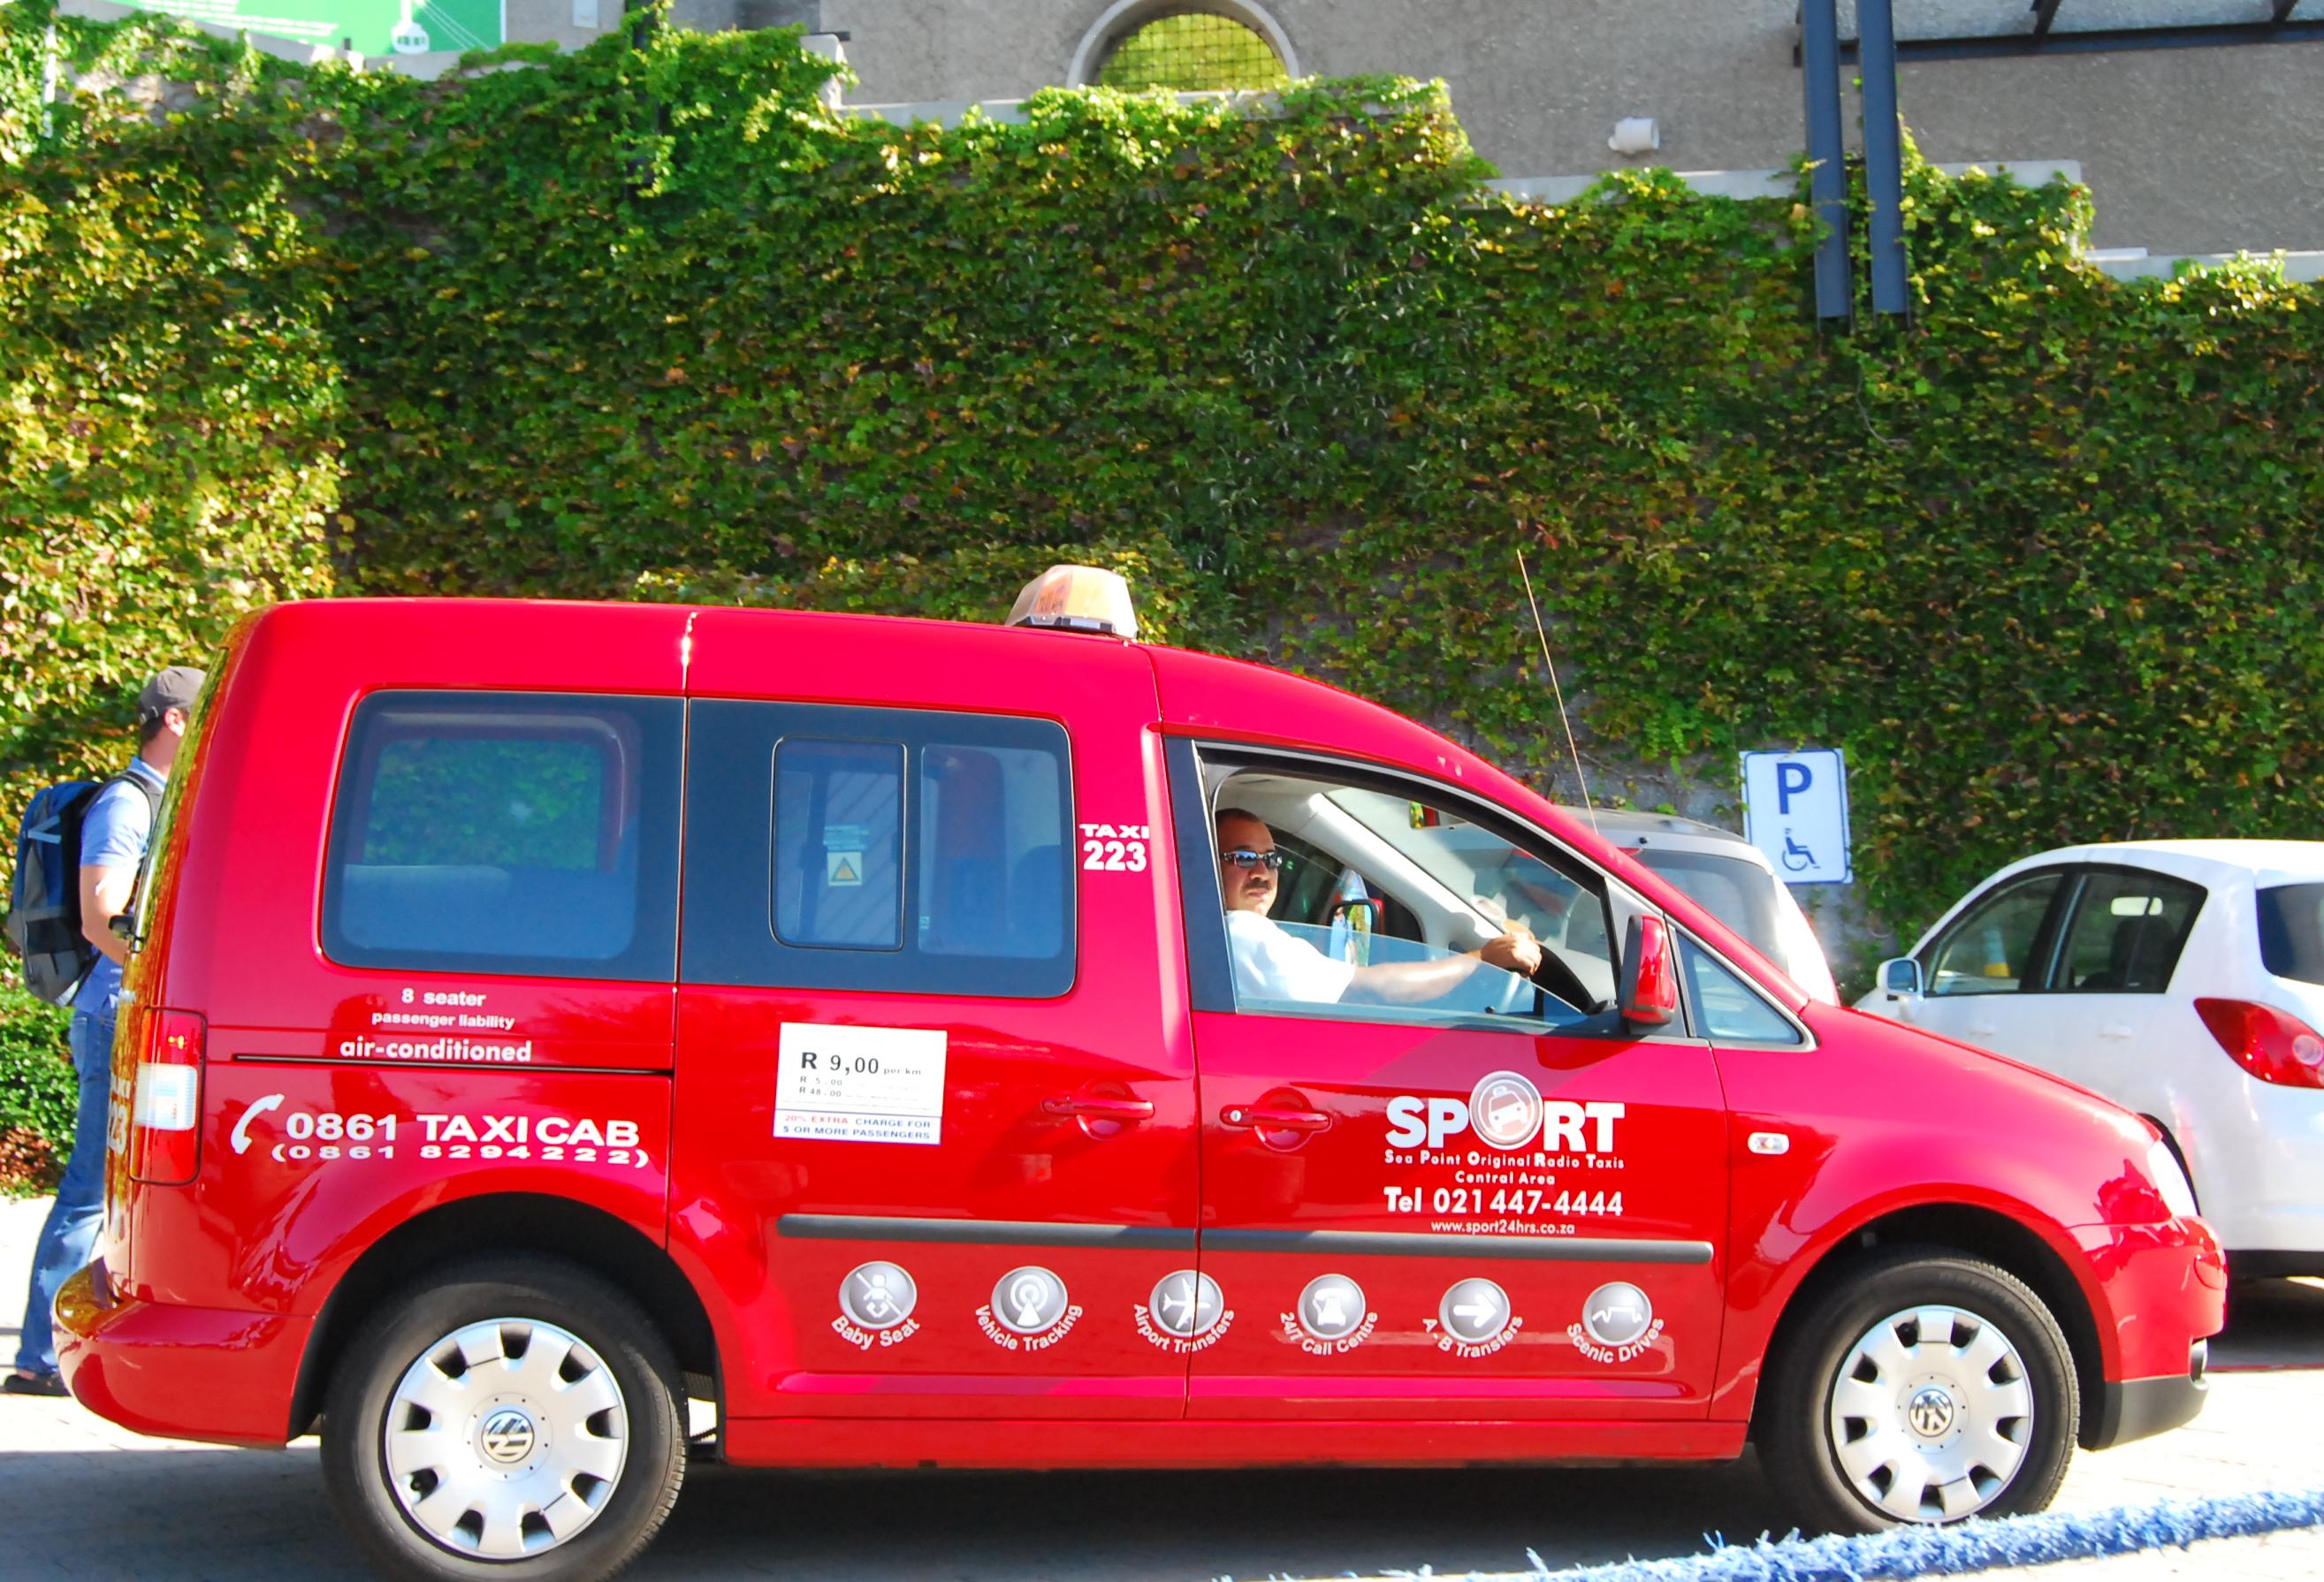 Toten Entbunden Mutter Wurde 3 Monate Bild De Taxi In Cape